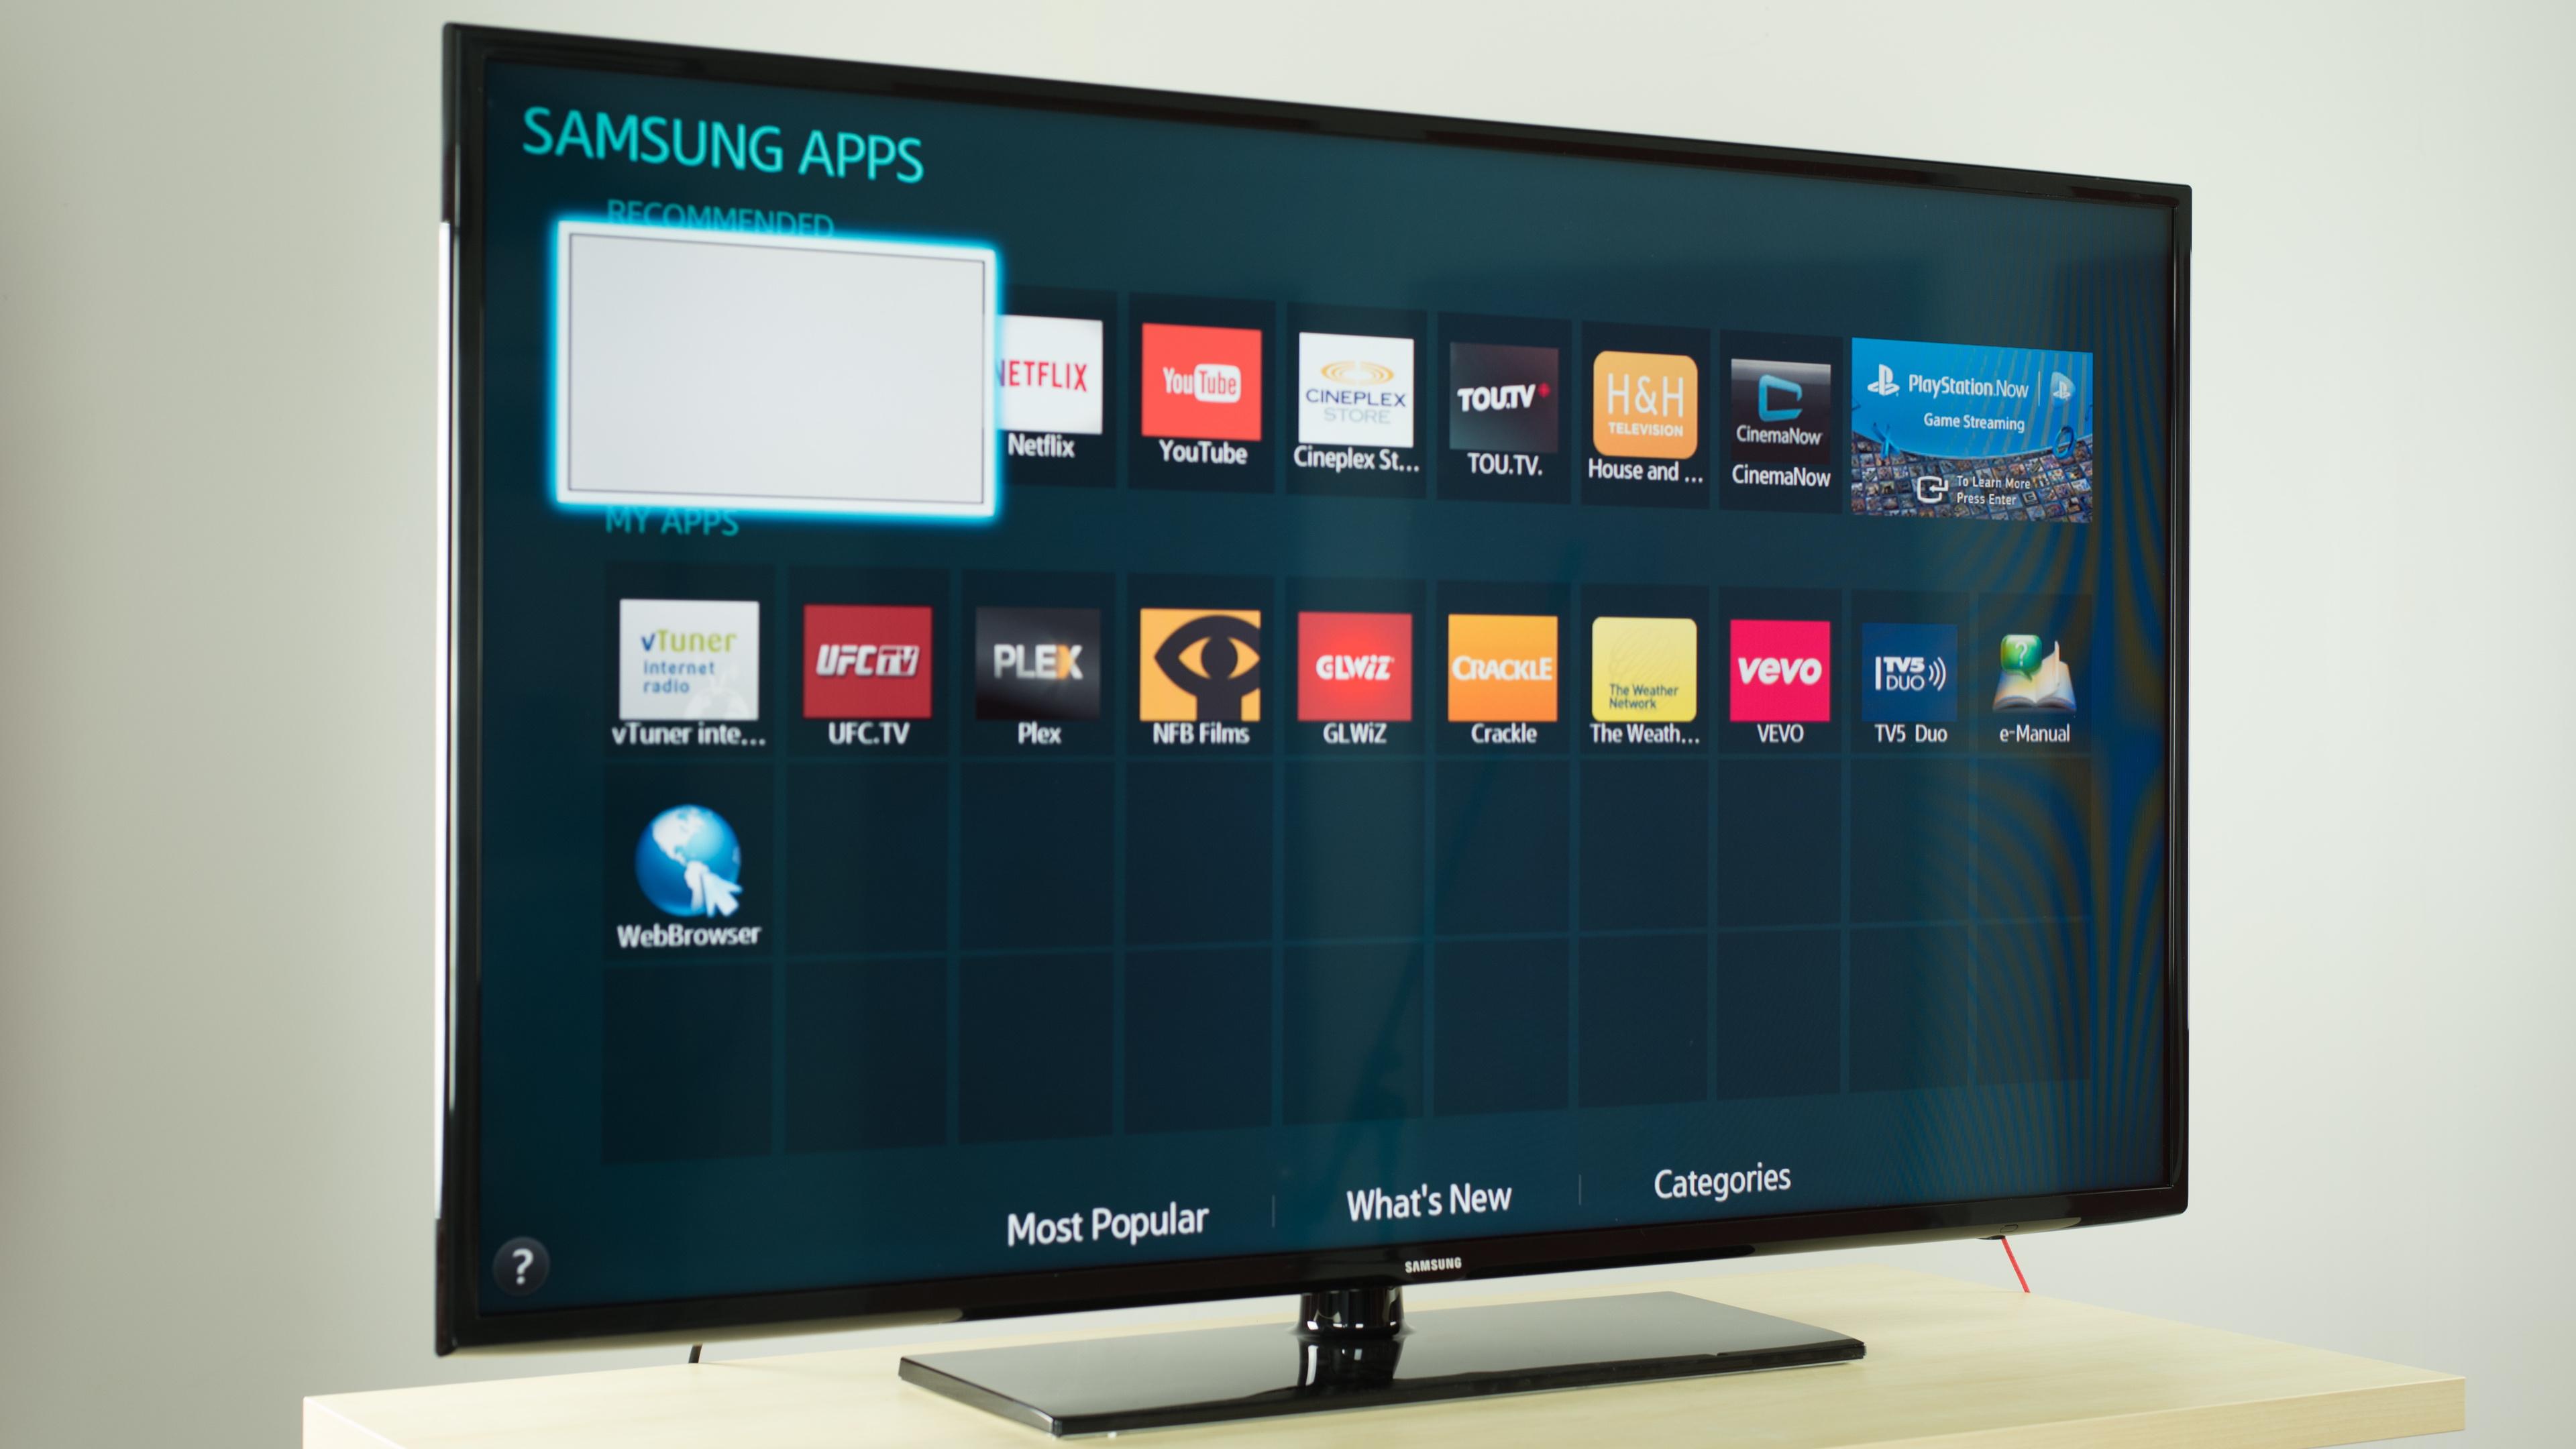 ea753856c29 Samsung J6200 Review (UN40J6200